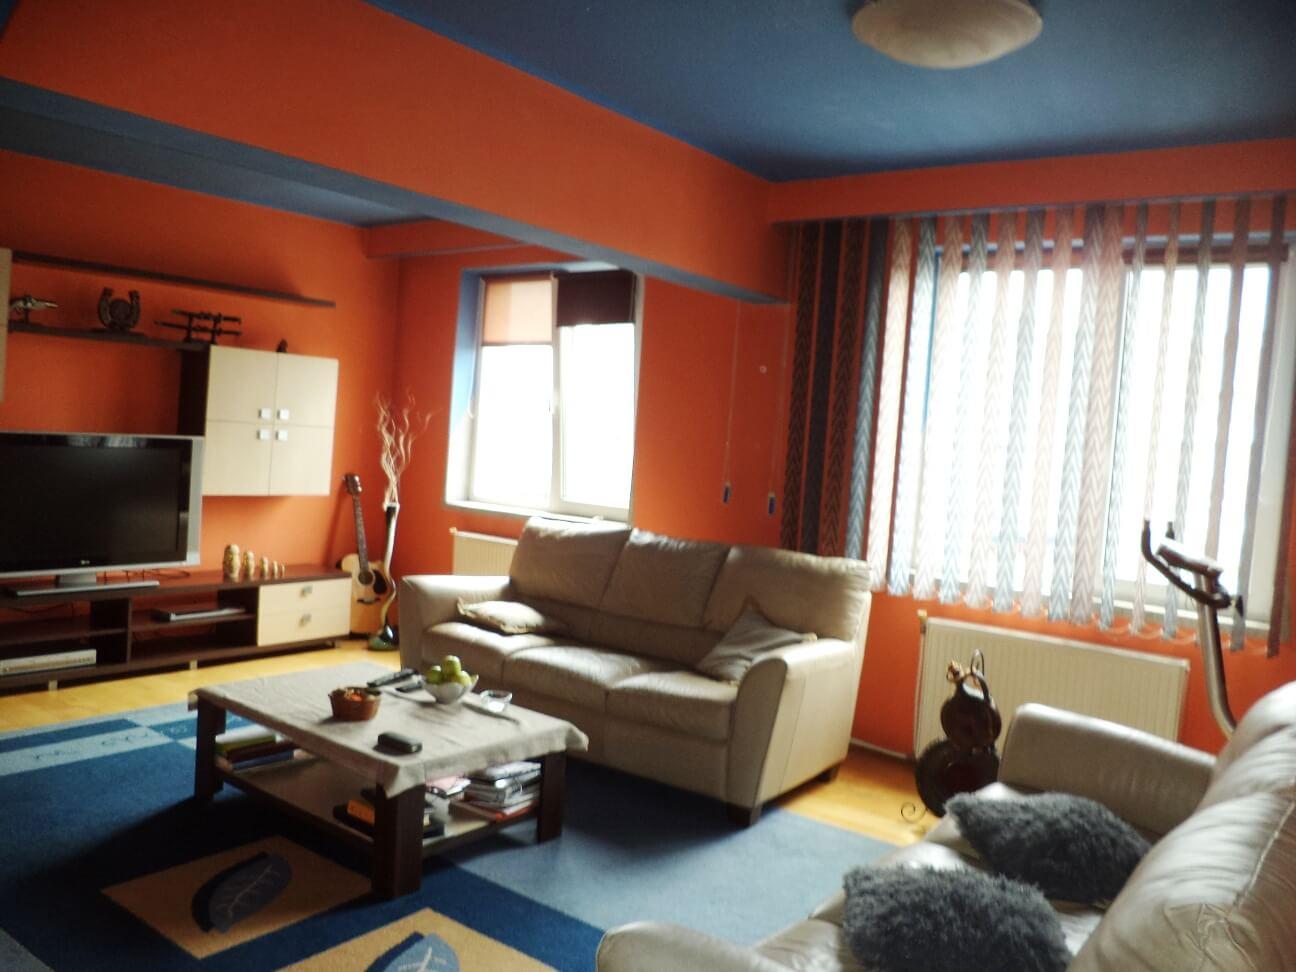 Apartament 5 camere Baia Mare, Transilvaniei – Muzeul de Mineralogie!